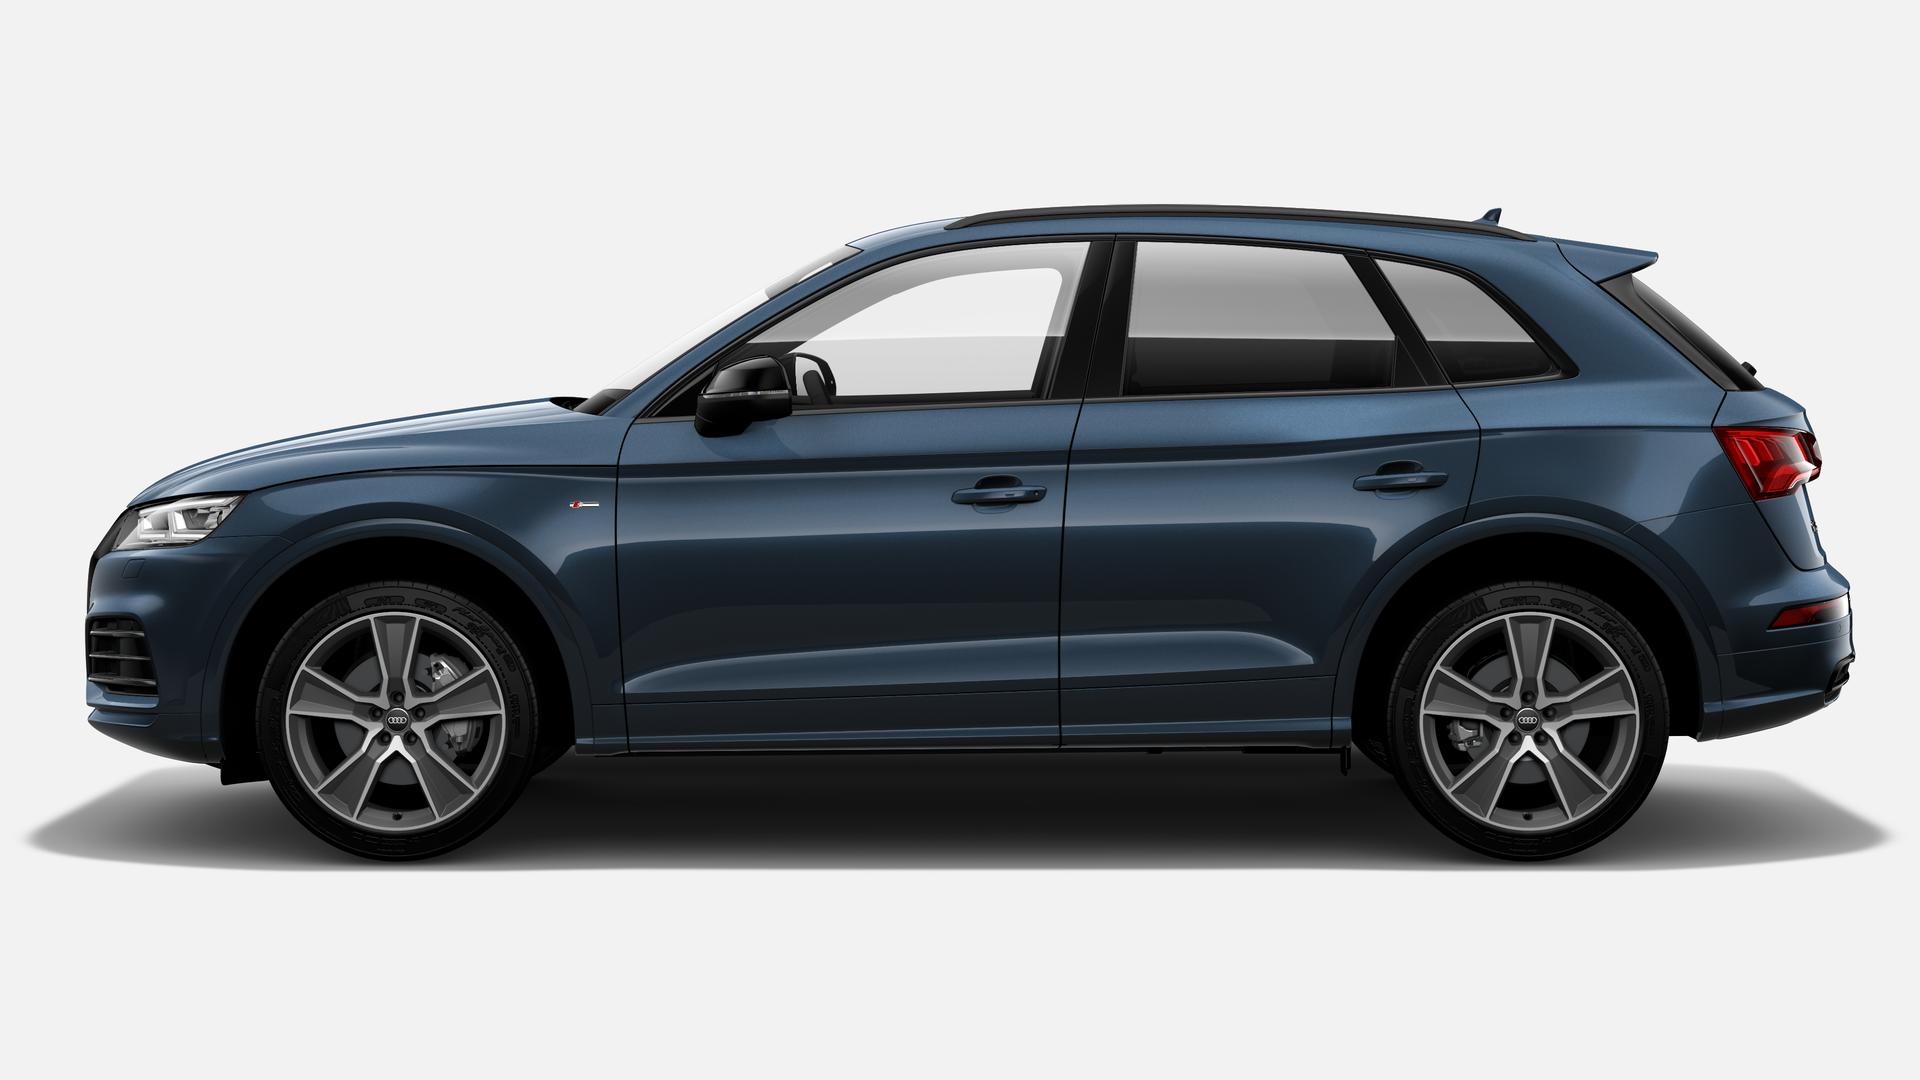 Vista Lateral izquierda de Audi Q5 2.0 TDI Black Line Quattro S Tronic 140 kW (190 CV)